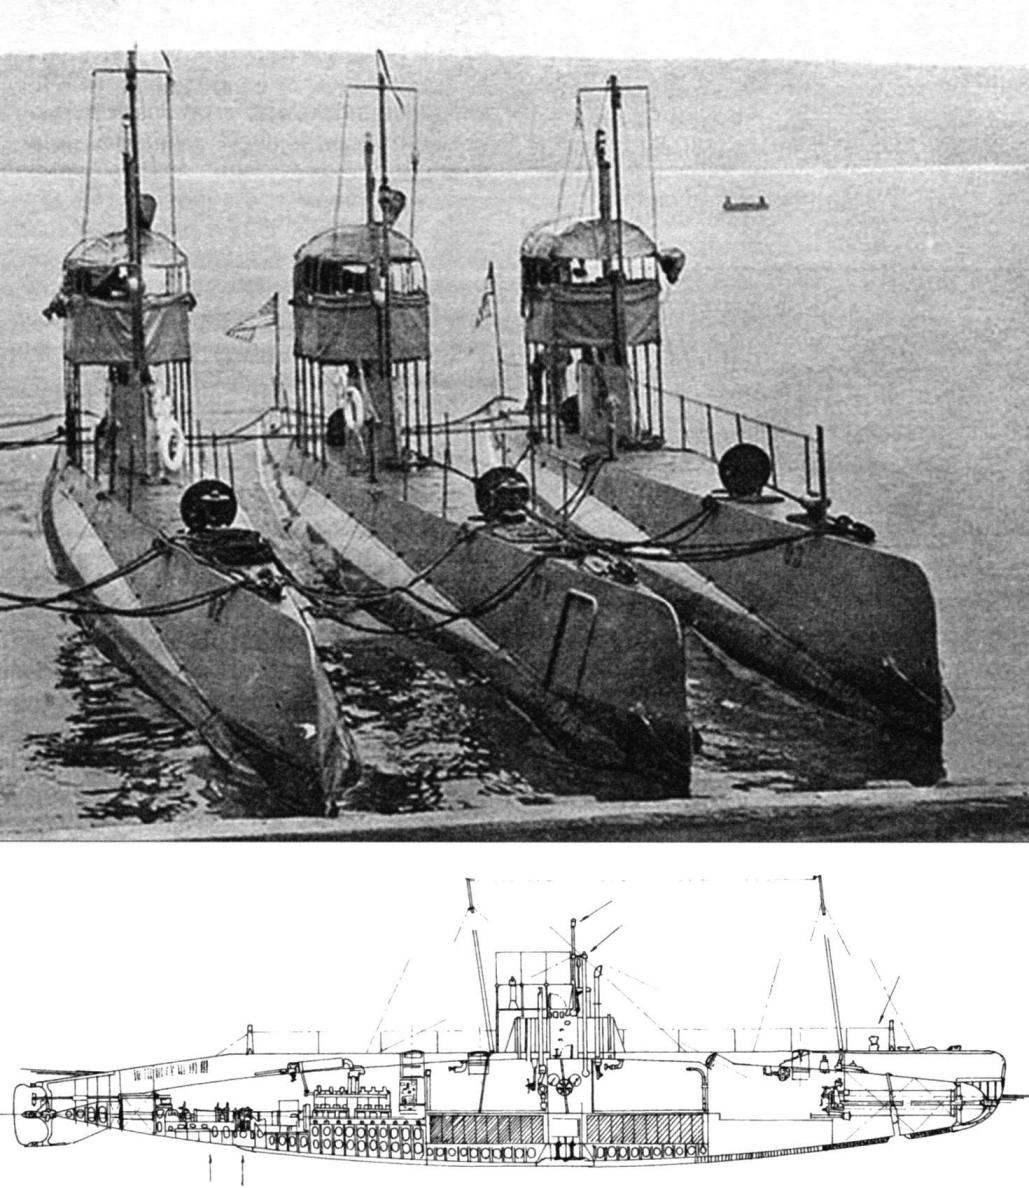 Submarines of the type